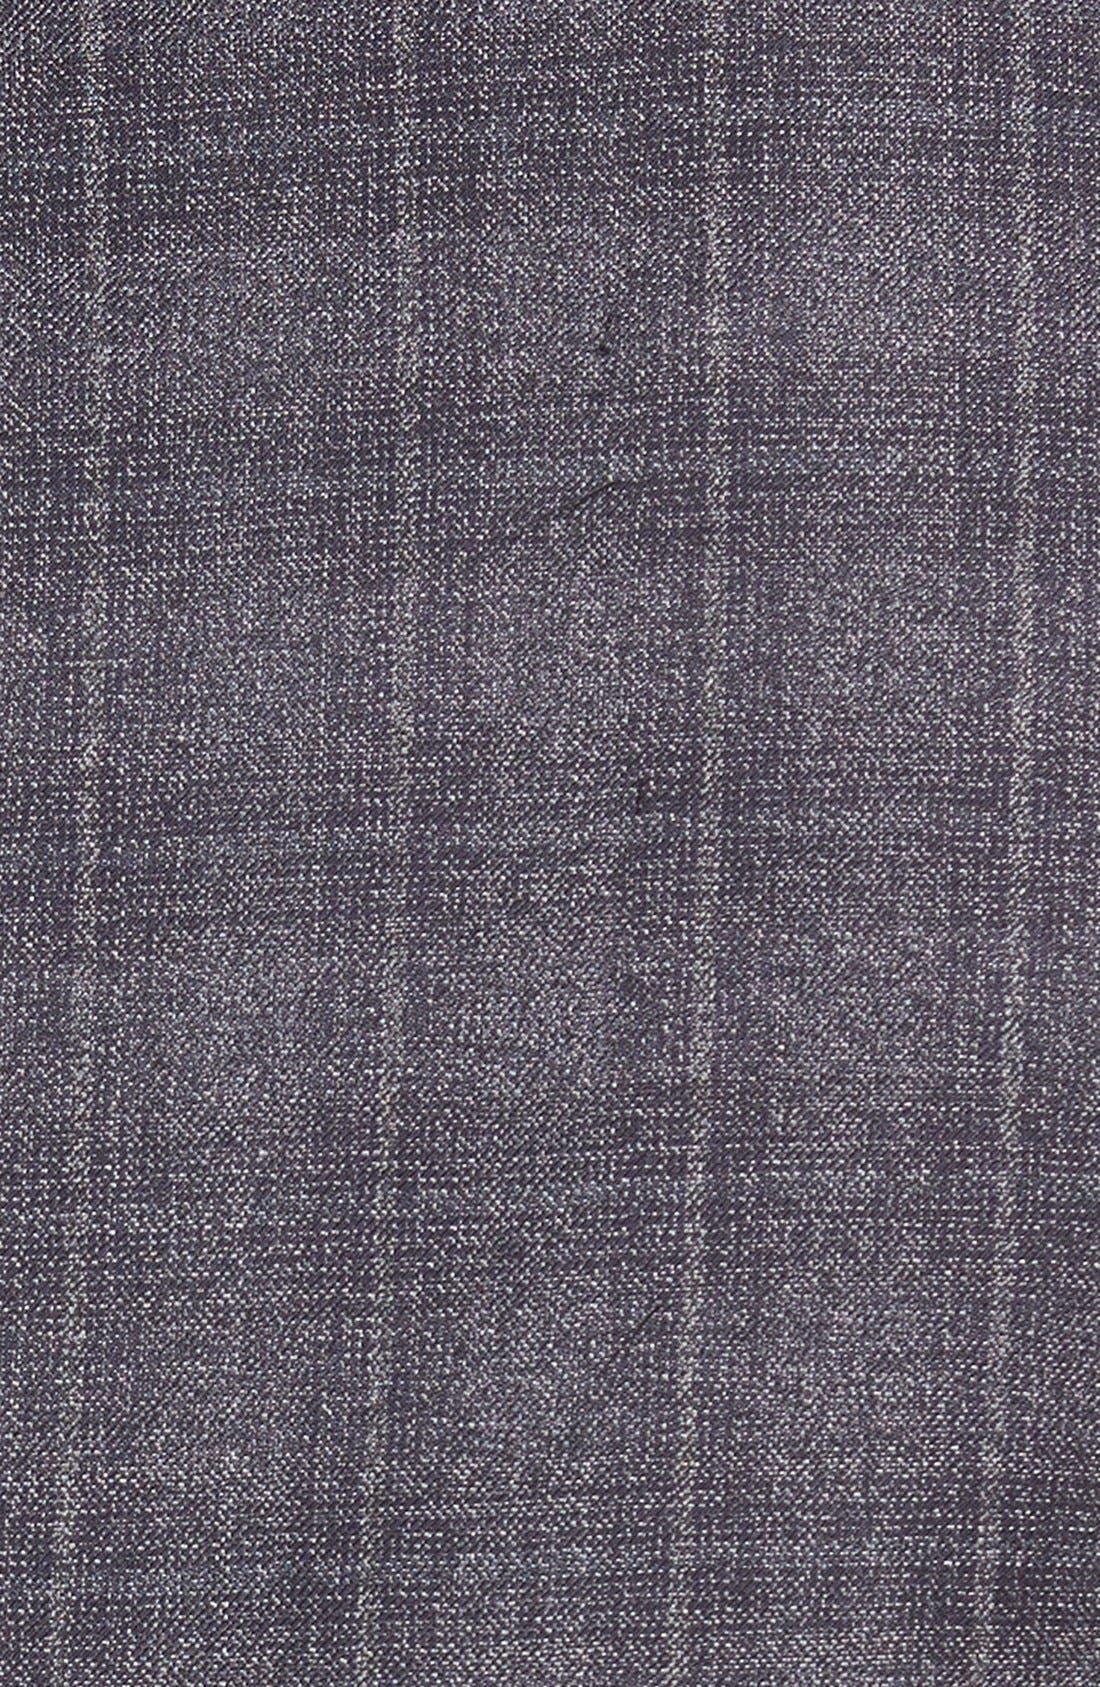 ZZDNUHUGO BOSS, BOSS 'Jayden' Trim Fit Plaid Wool Sport Coat, Alternate thumbnail 3, color, 420